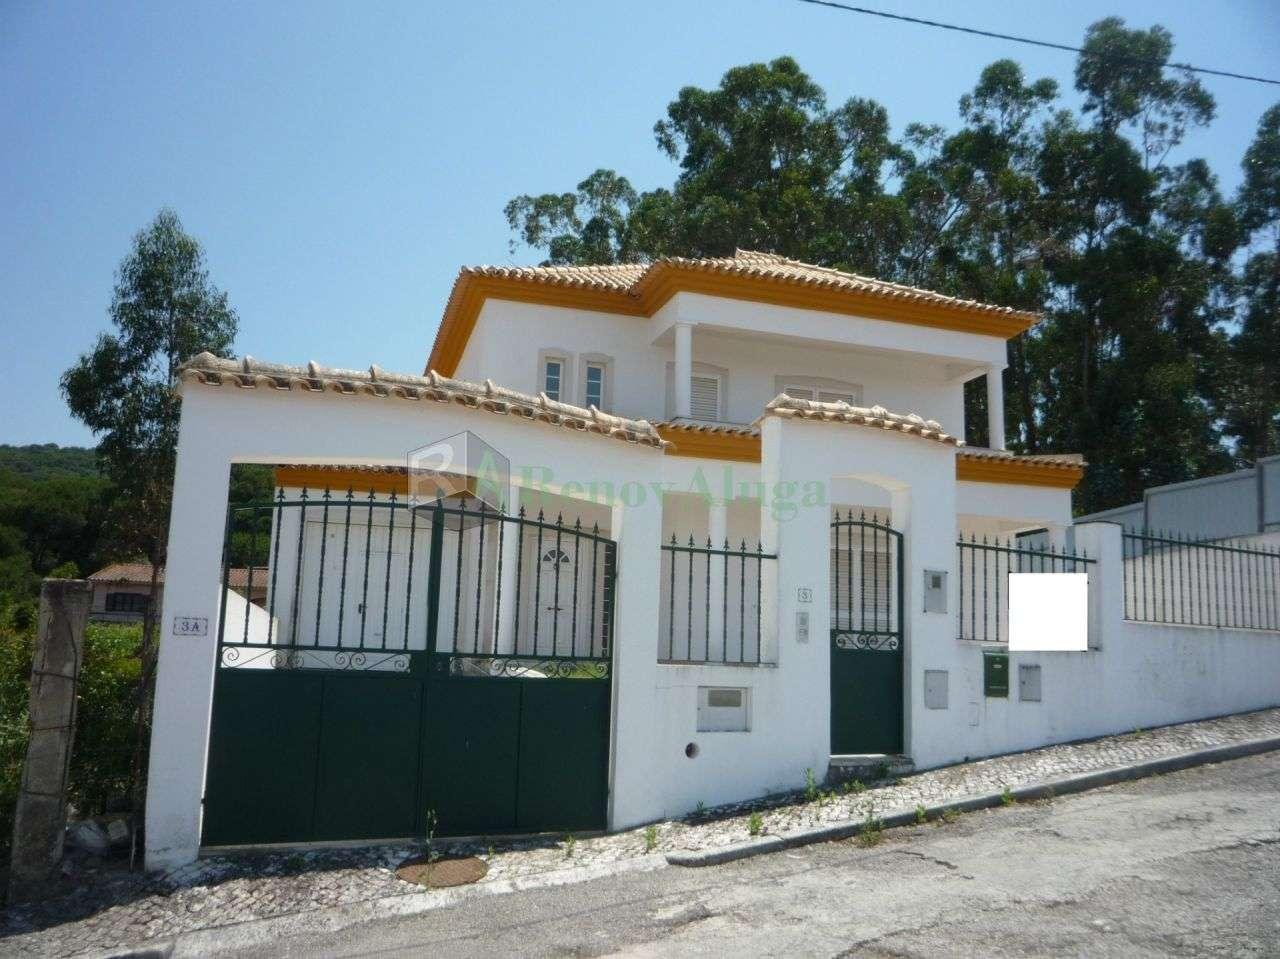 Moradia para arrendar, Quinta do Anjo, Setúbal - Foto 2